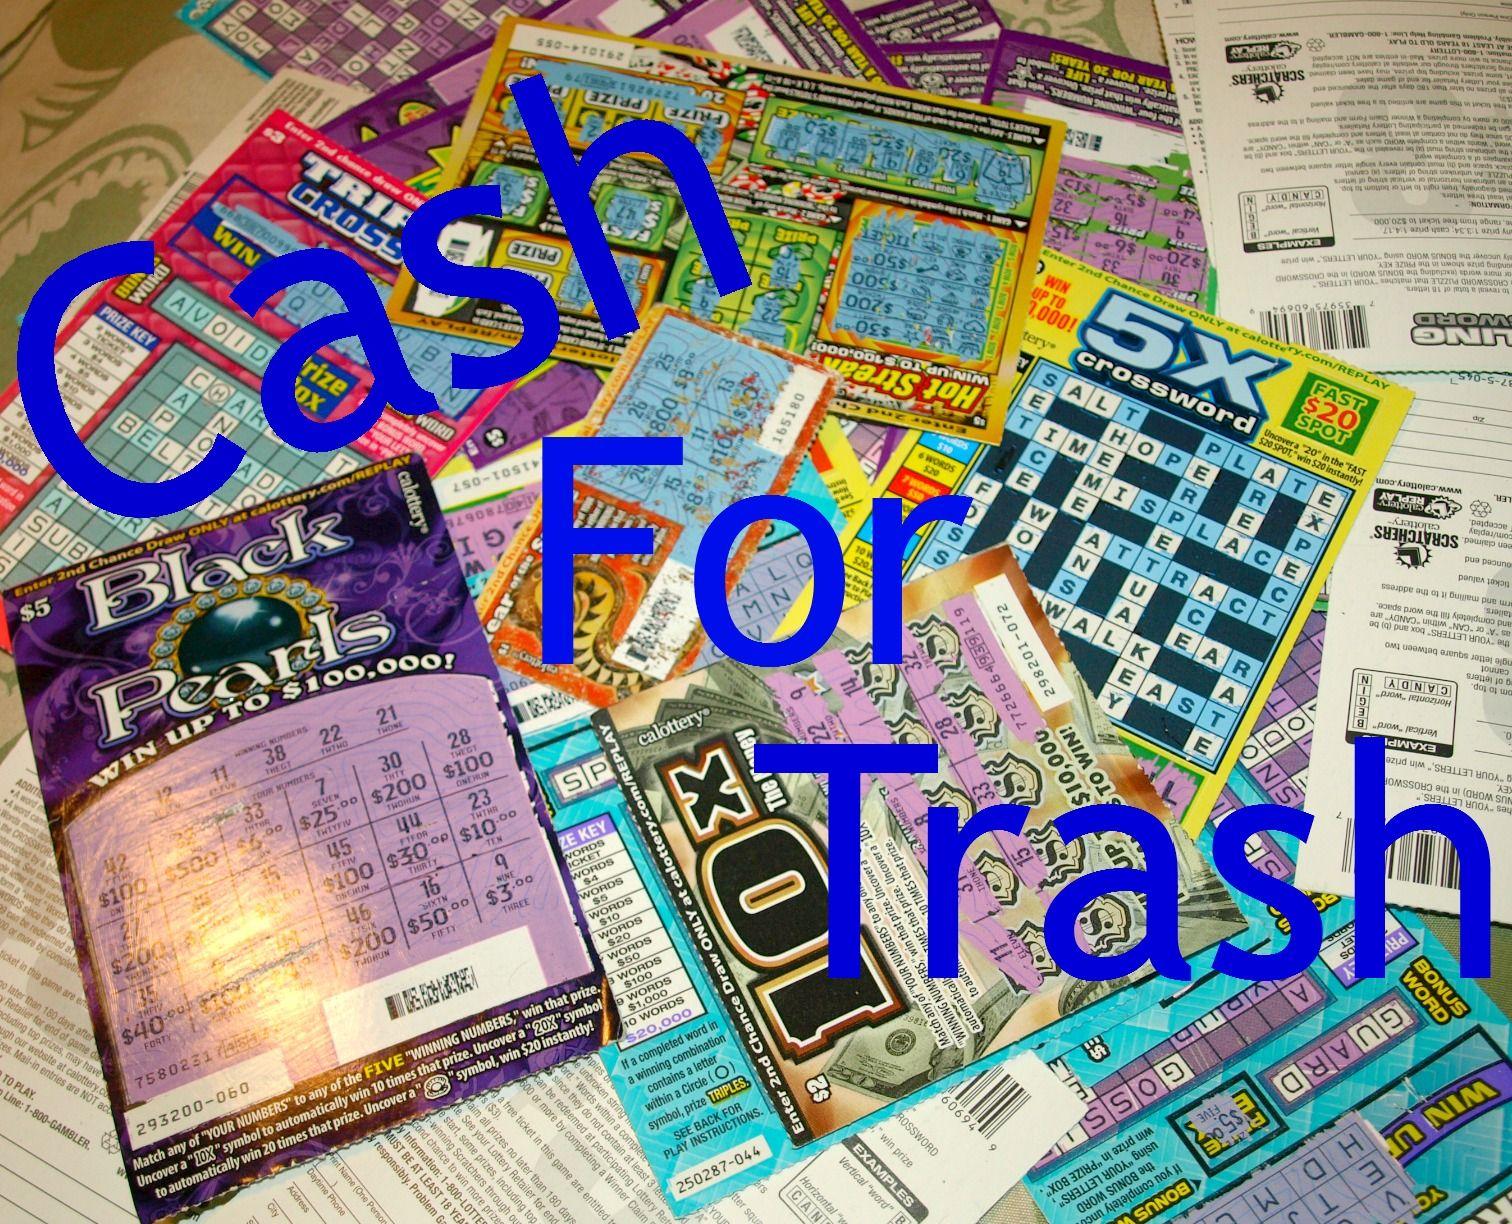 Cash for trash trash win money shopping hacks